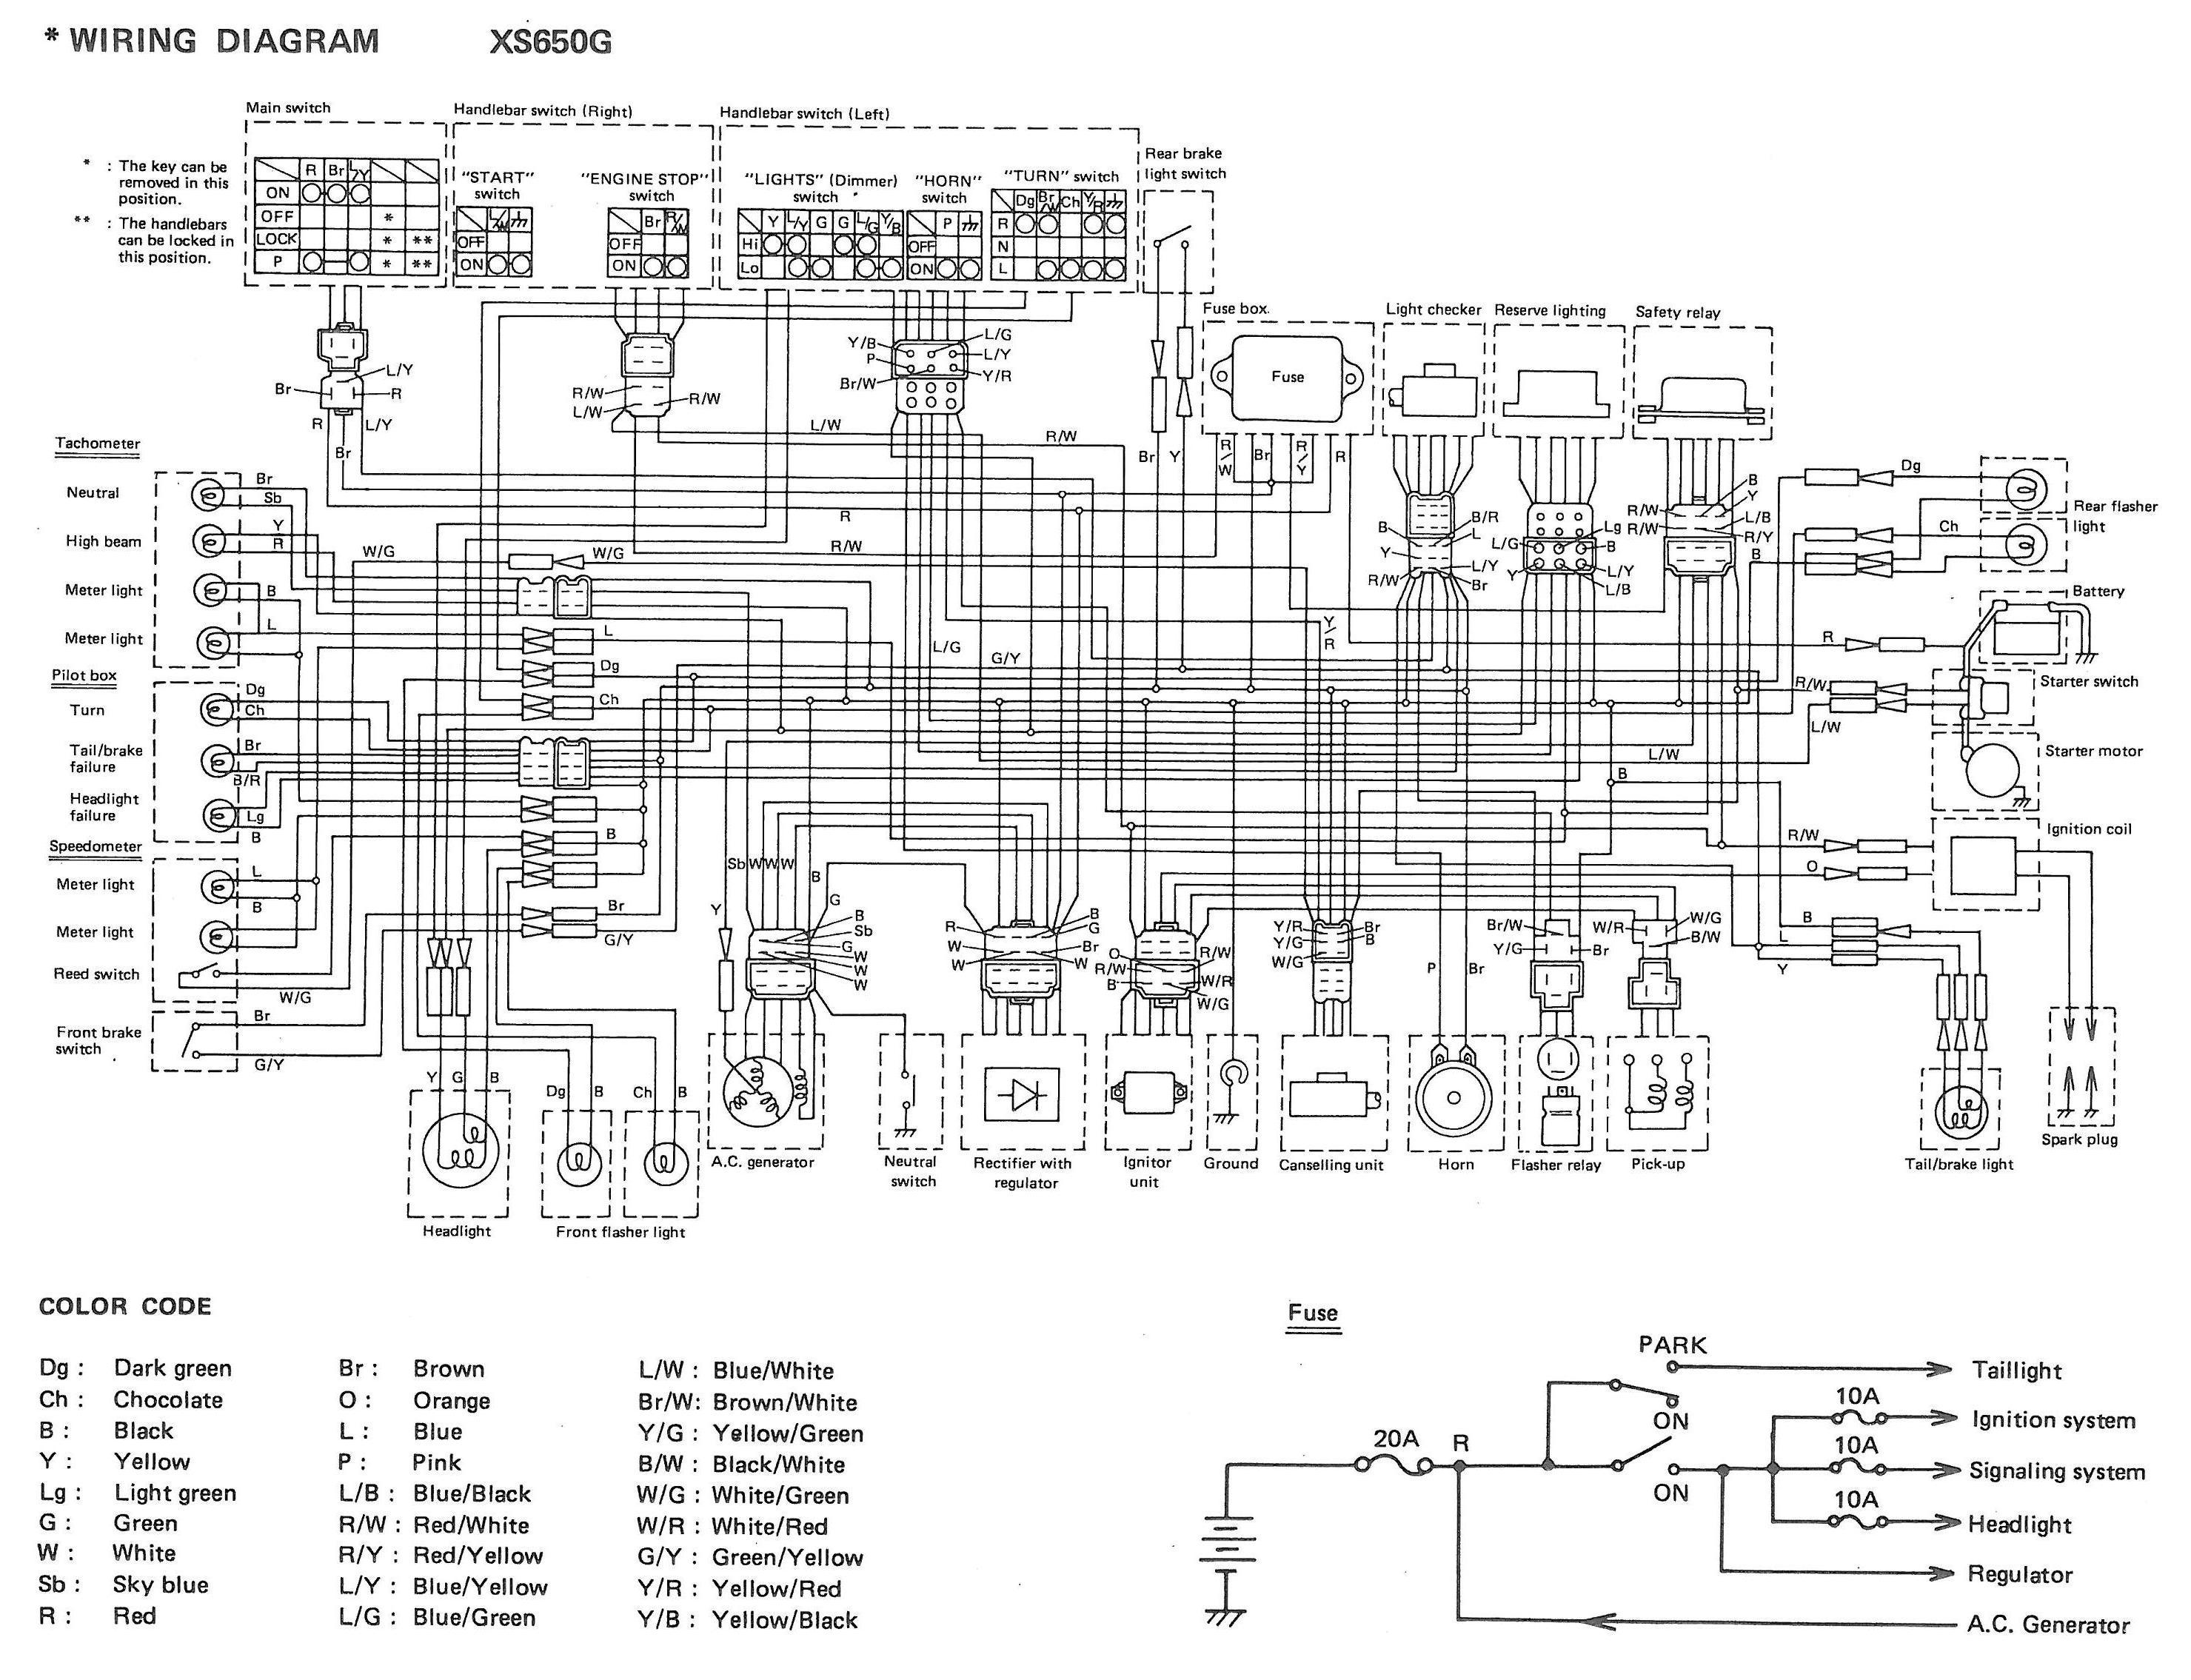 Ford Taurus Radio Wiring Diagram As Well Aprilia Rs 50 Af1 Sr500 Auto Electrical Rh Radtour Co